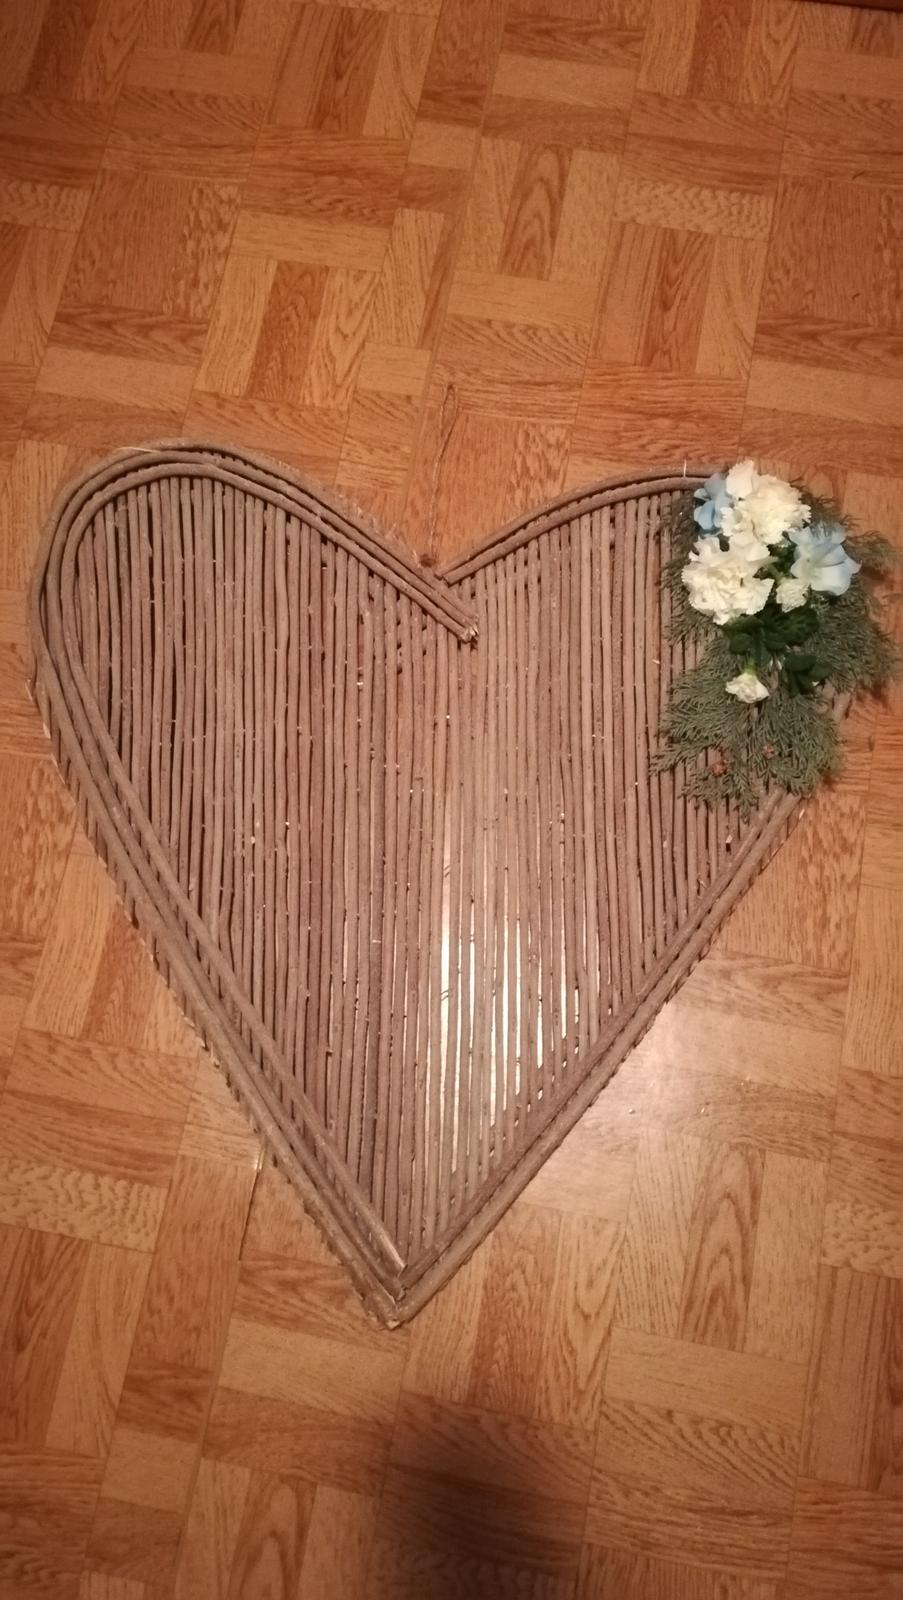 Velke srdce z konarikov - Obrázok č. 1